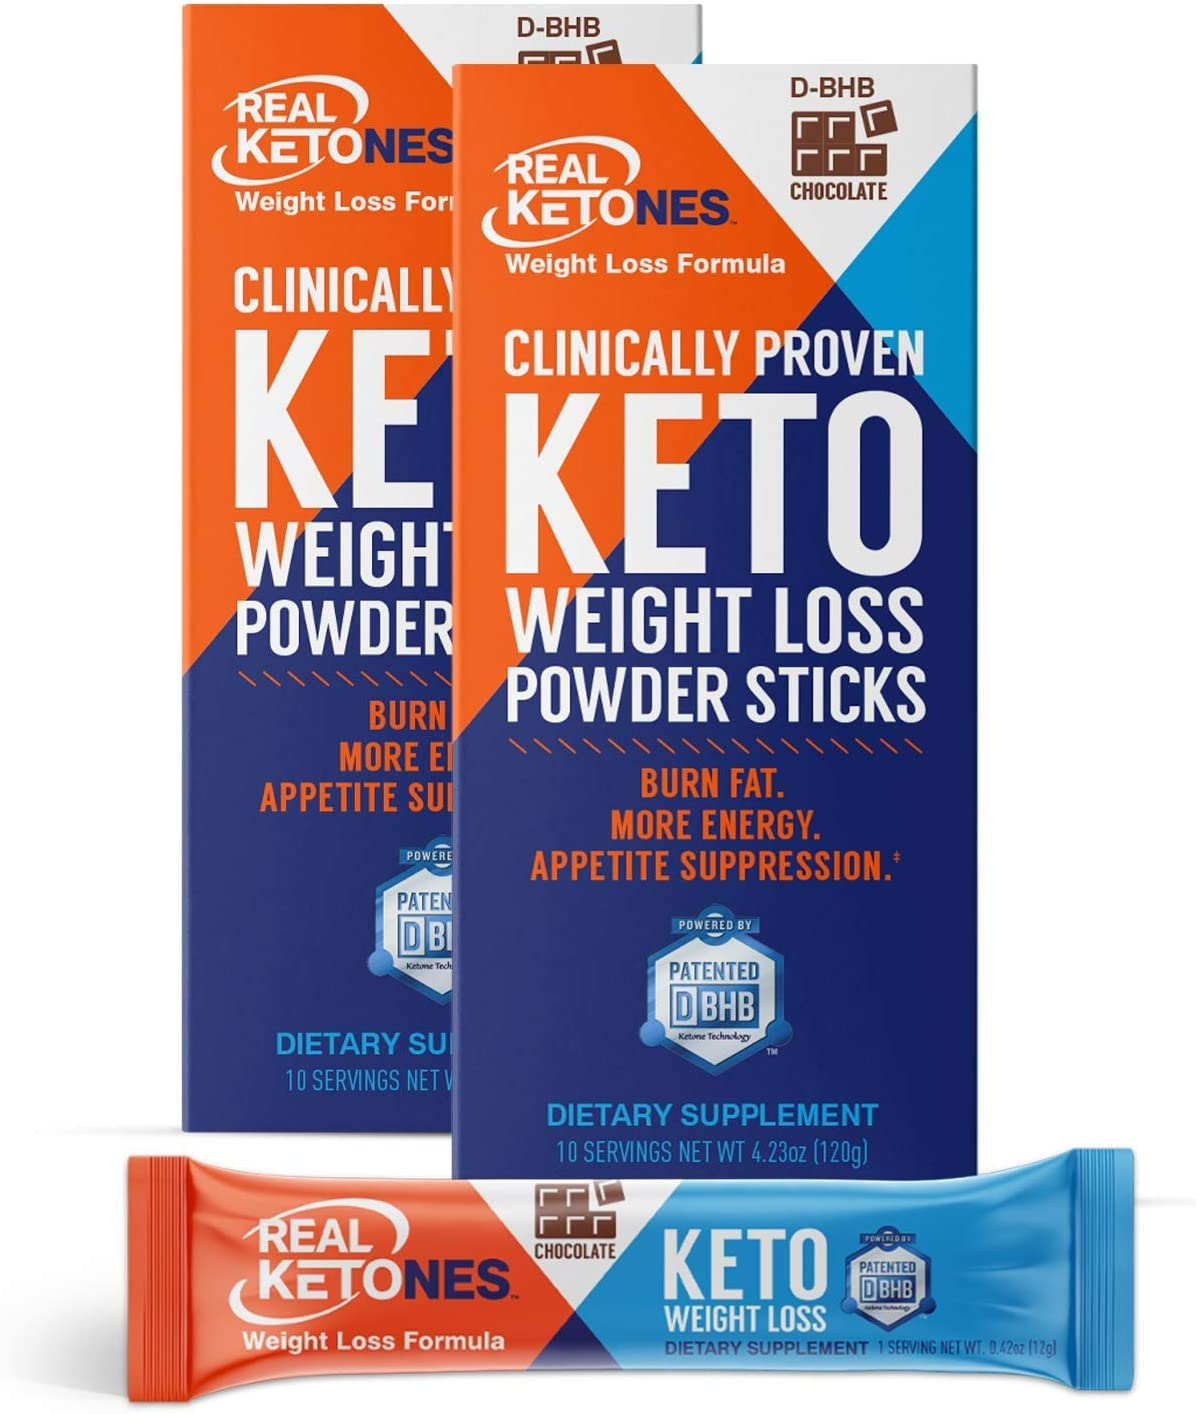 Real Ketones- Exogenous Keto- D BHB Drink Mix Max 88% OFF Max 71% OFF Su Electrolytes- +